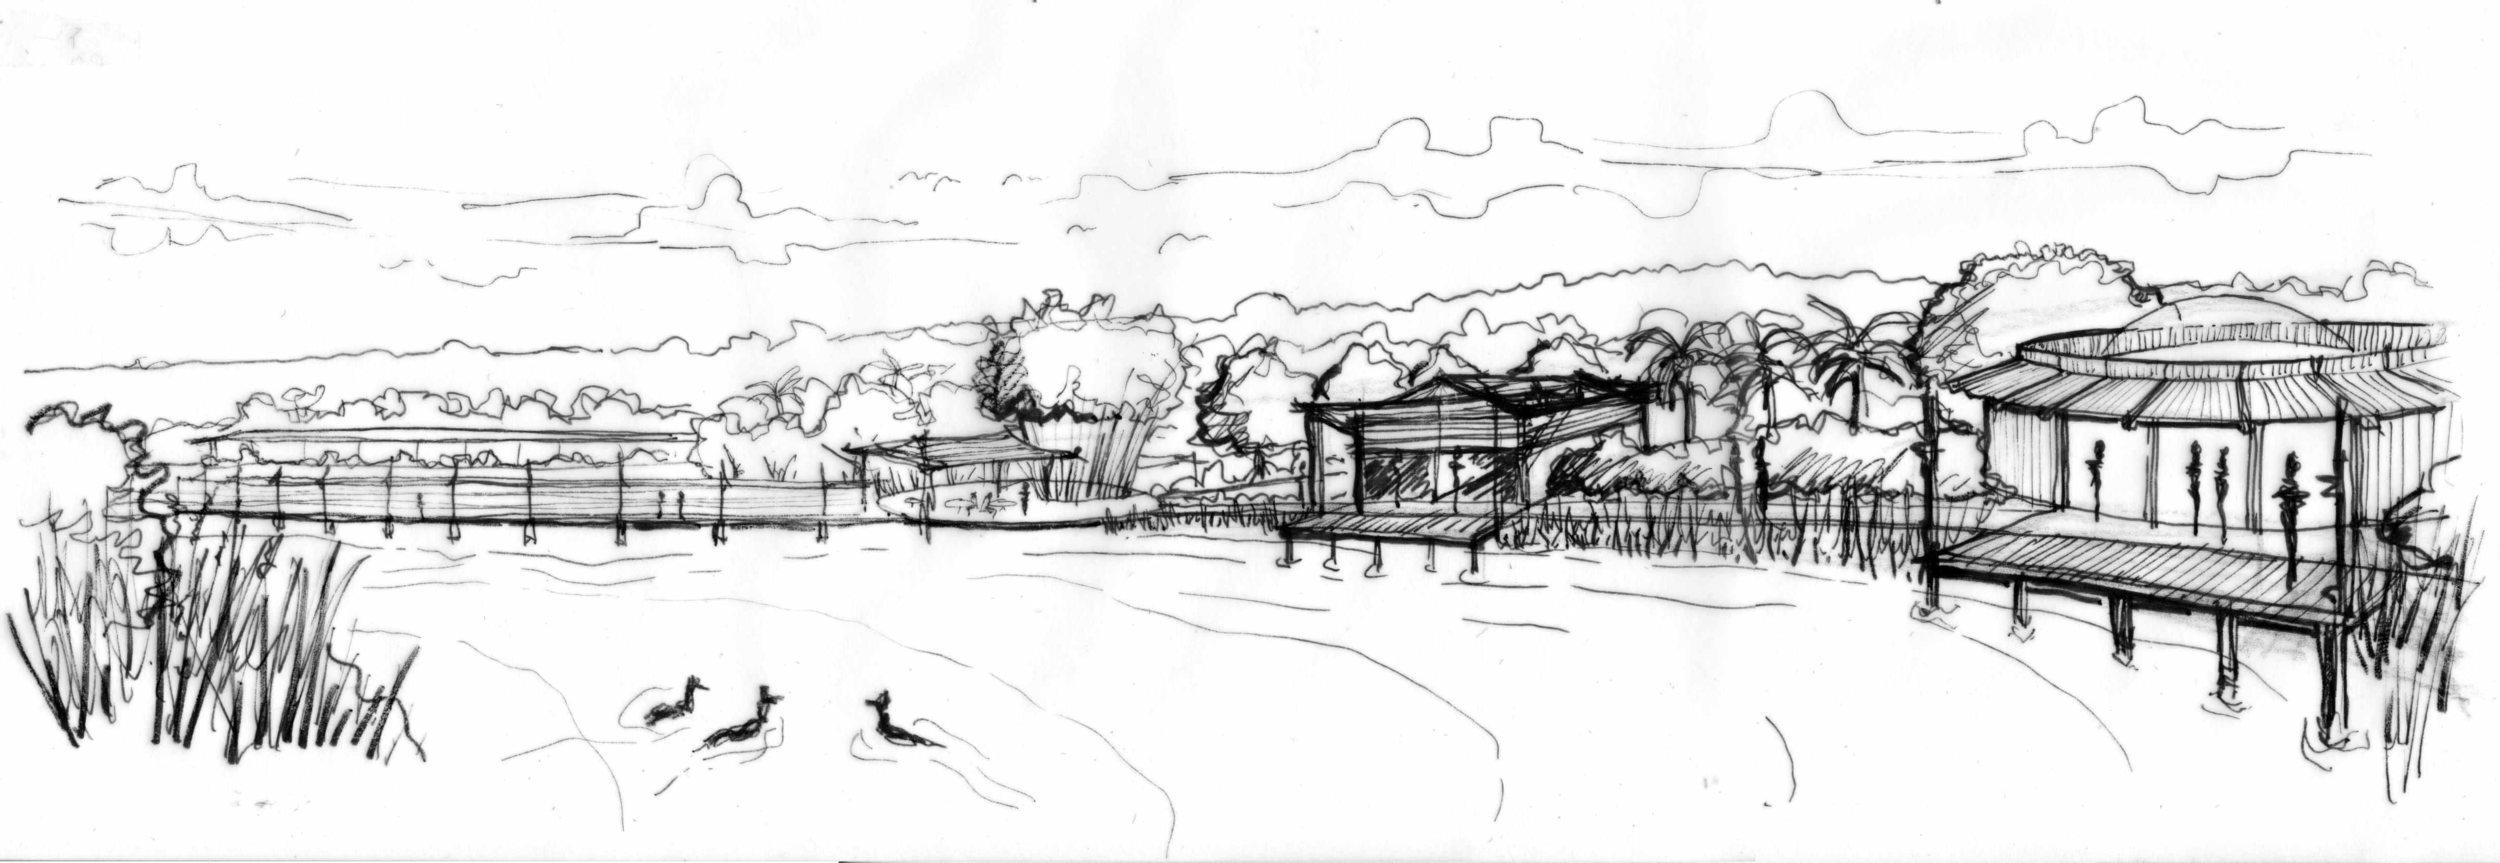 conf centre spa lake sketch.jpg